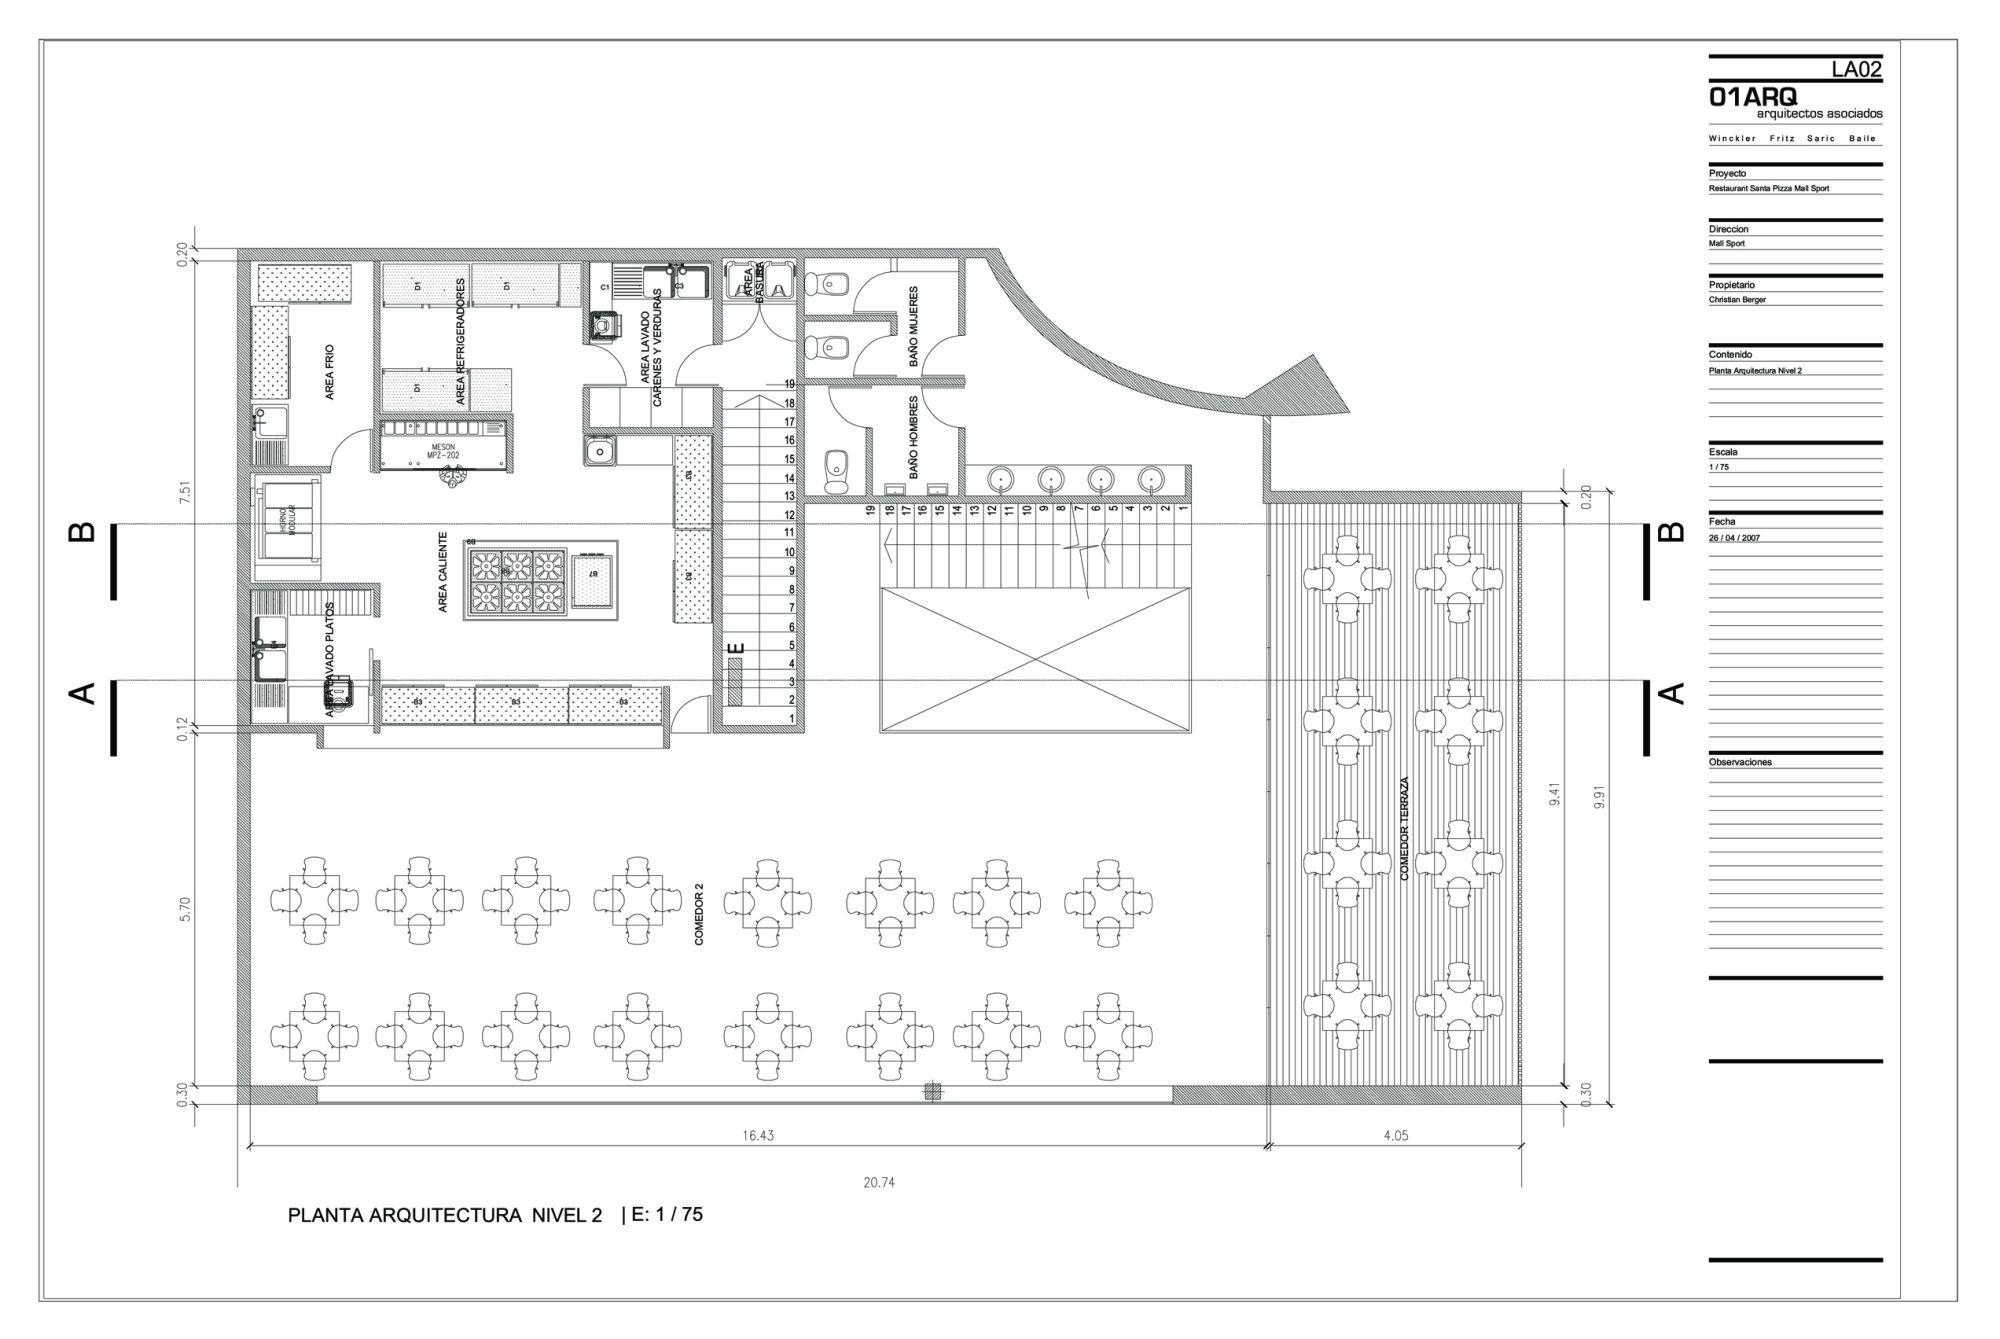 Galeria de shopping esportivo santa pizza 01arq 18 for Planta arquitectonica pdf